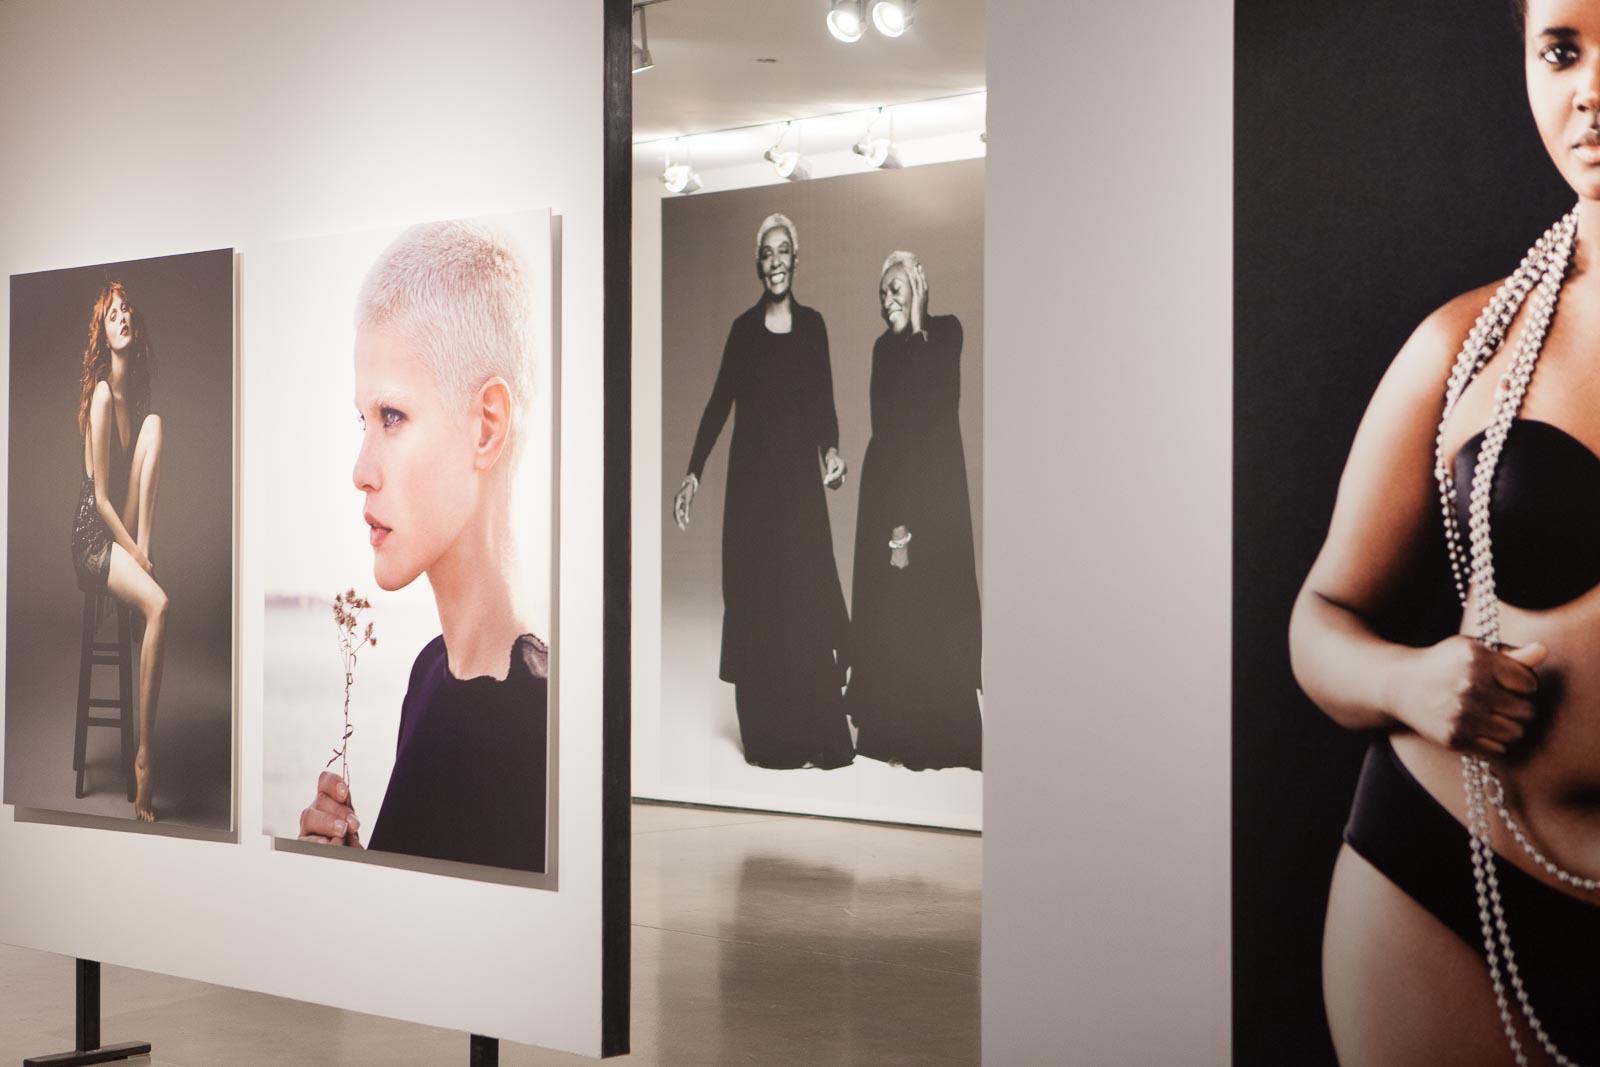 alexi-lubomirski-diverse-beauty-exhibition-robertiaga-10